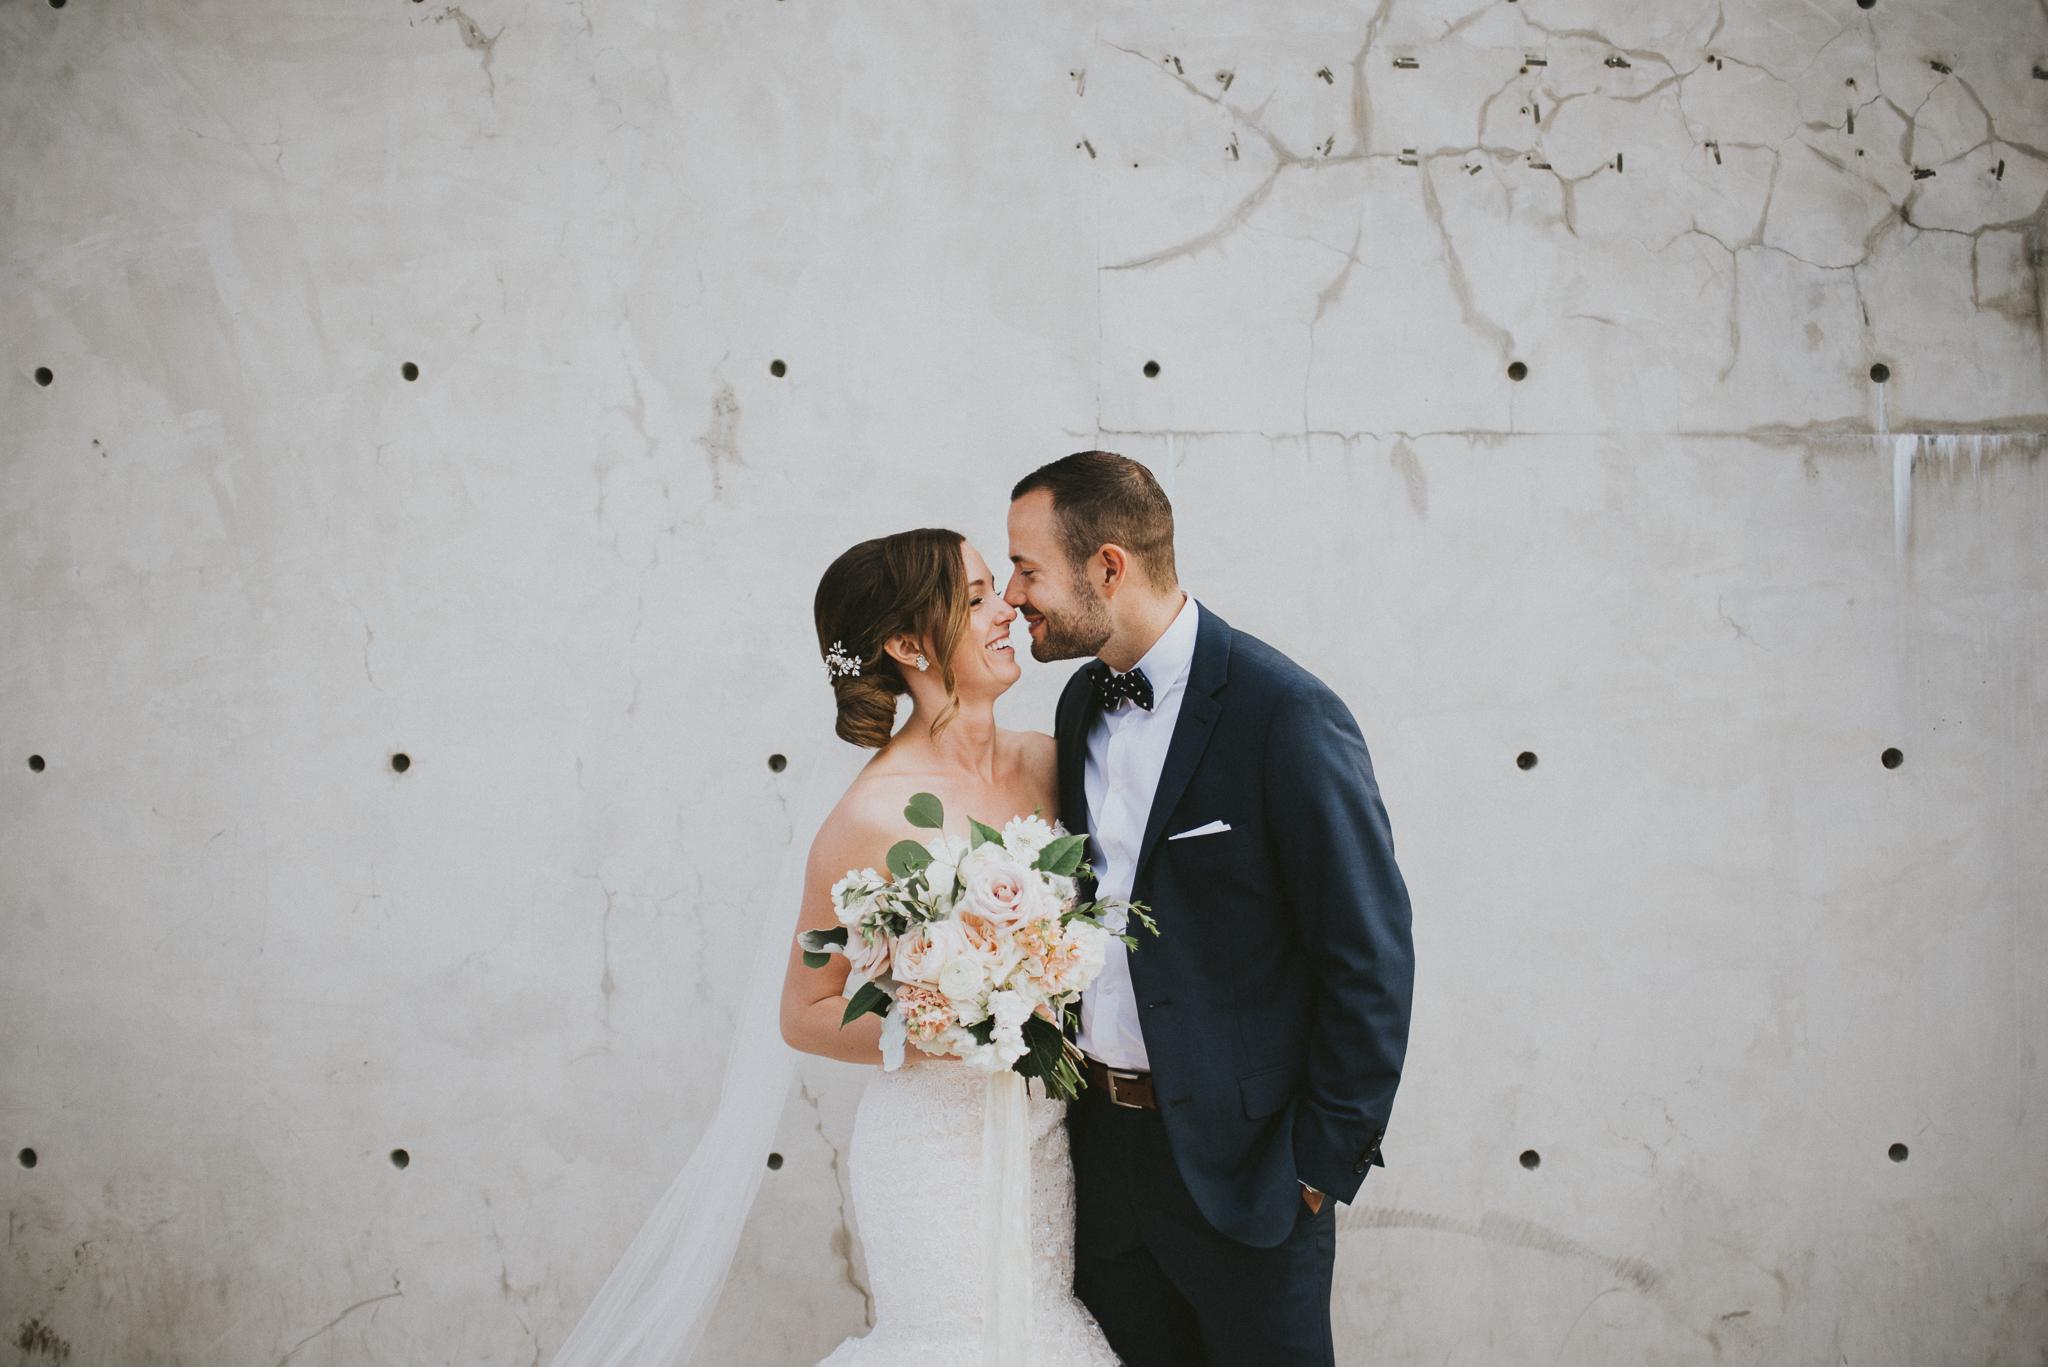 111-permanent-vancouver-wedding-courtneysteven-web-8440.jpg